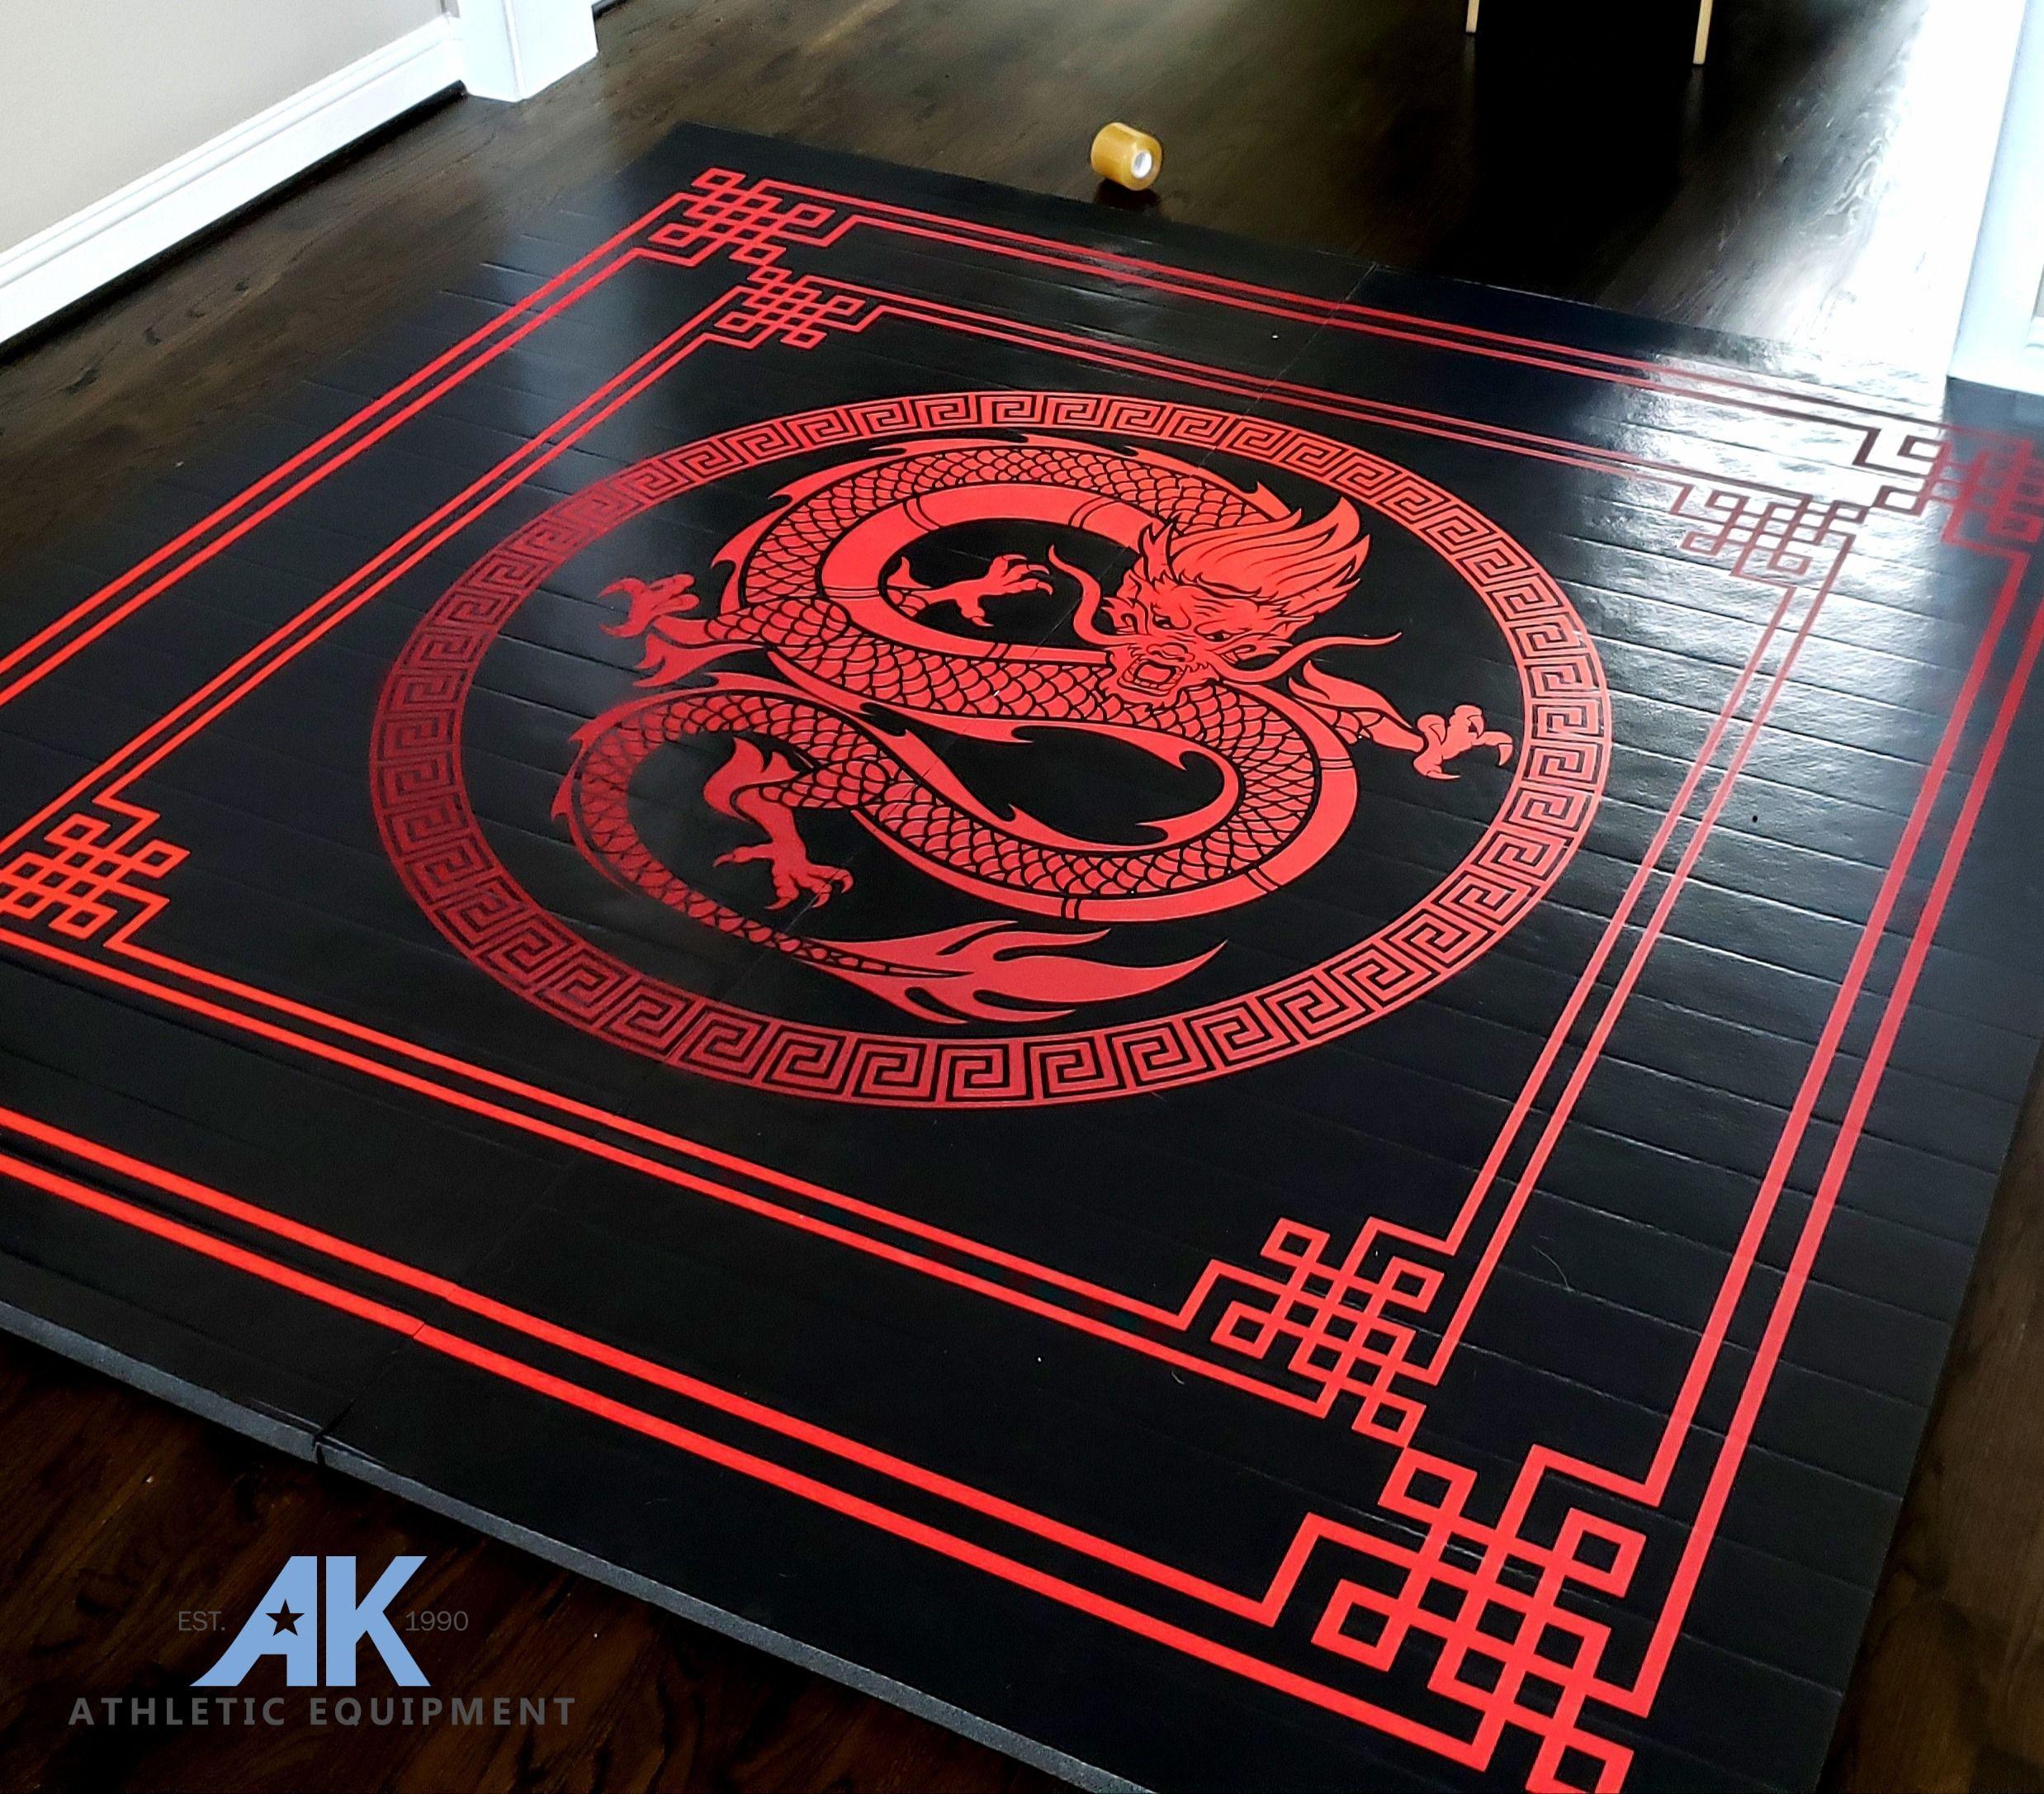 Dragon Digitally Printed 8 X 8 X 1 3 8 Roll Up Mma Grappling Mat Martial Arts Mats Martial Arts Training Equipment Martial Arts